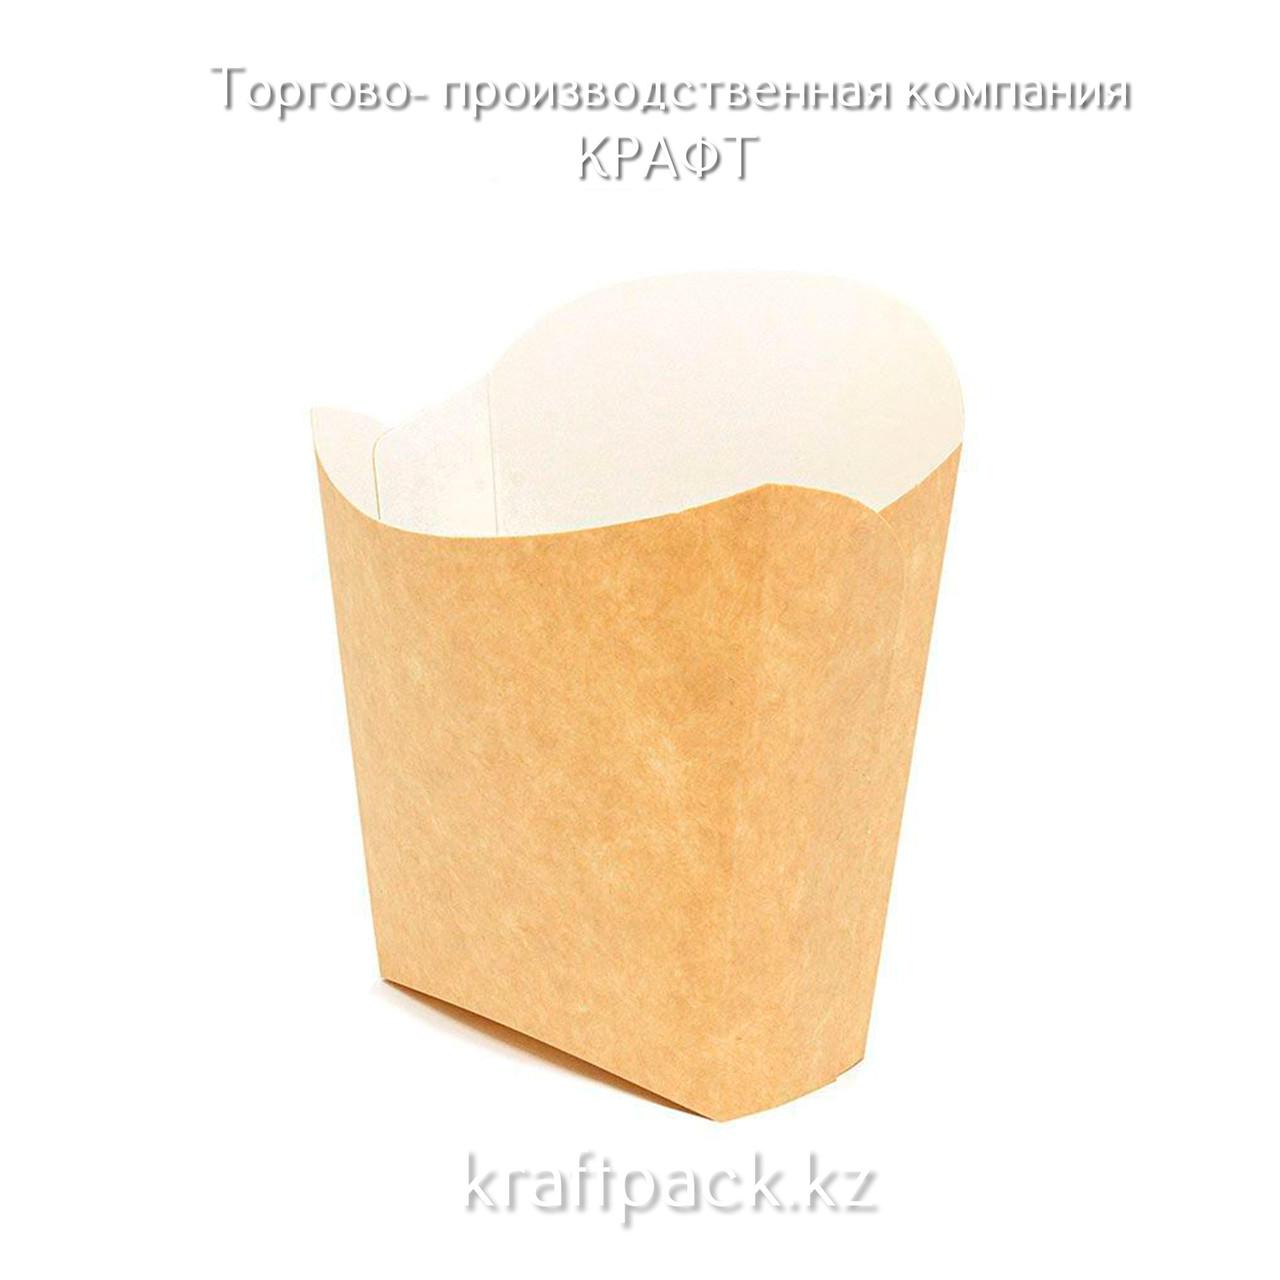 Упаковка для картофеля фри, контейнер BioBox Fry Pack 450мл, Крафт (50/500)